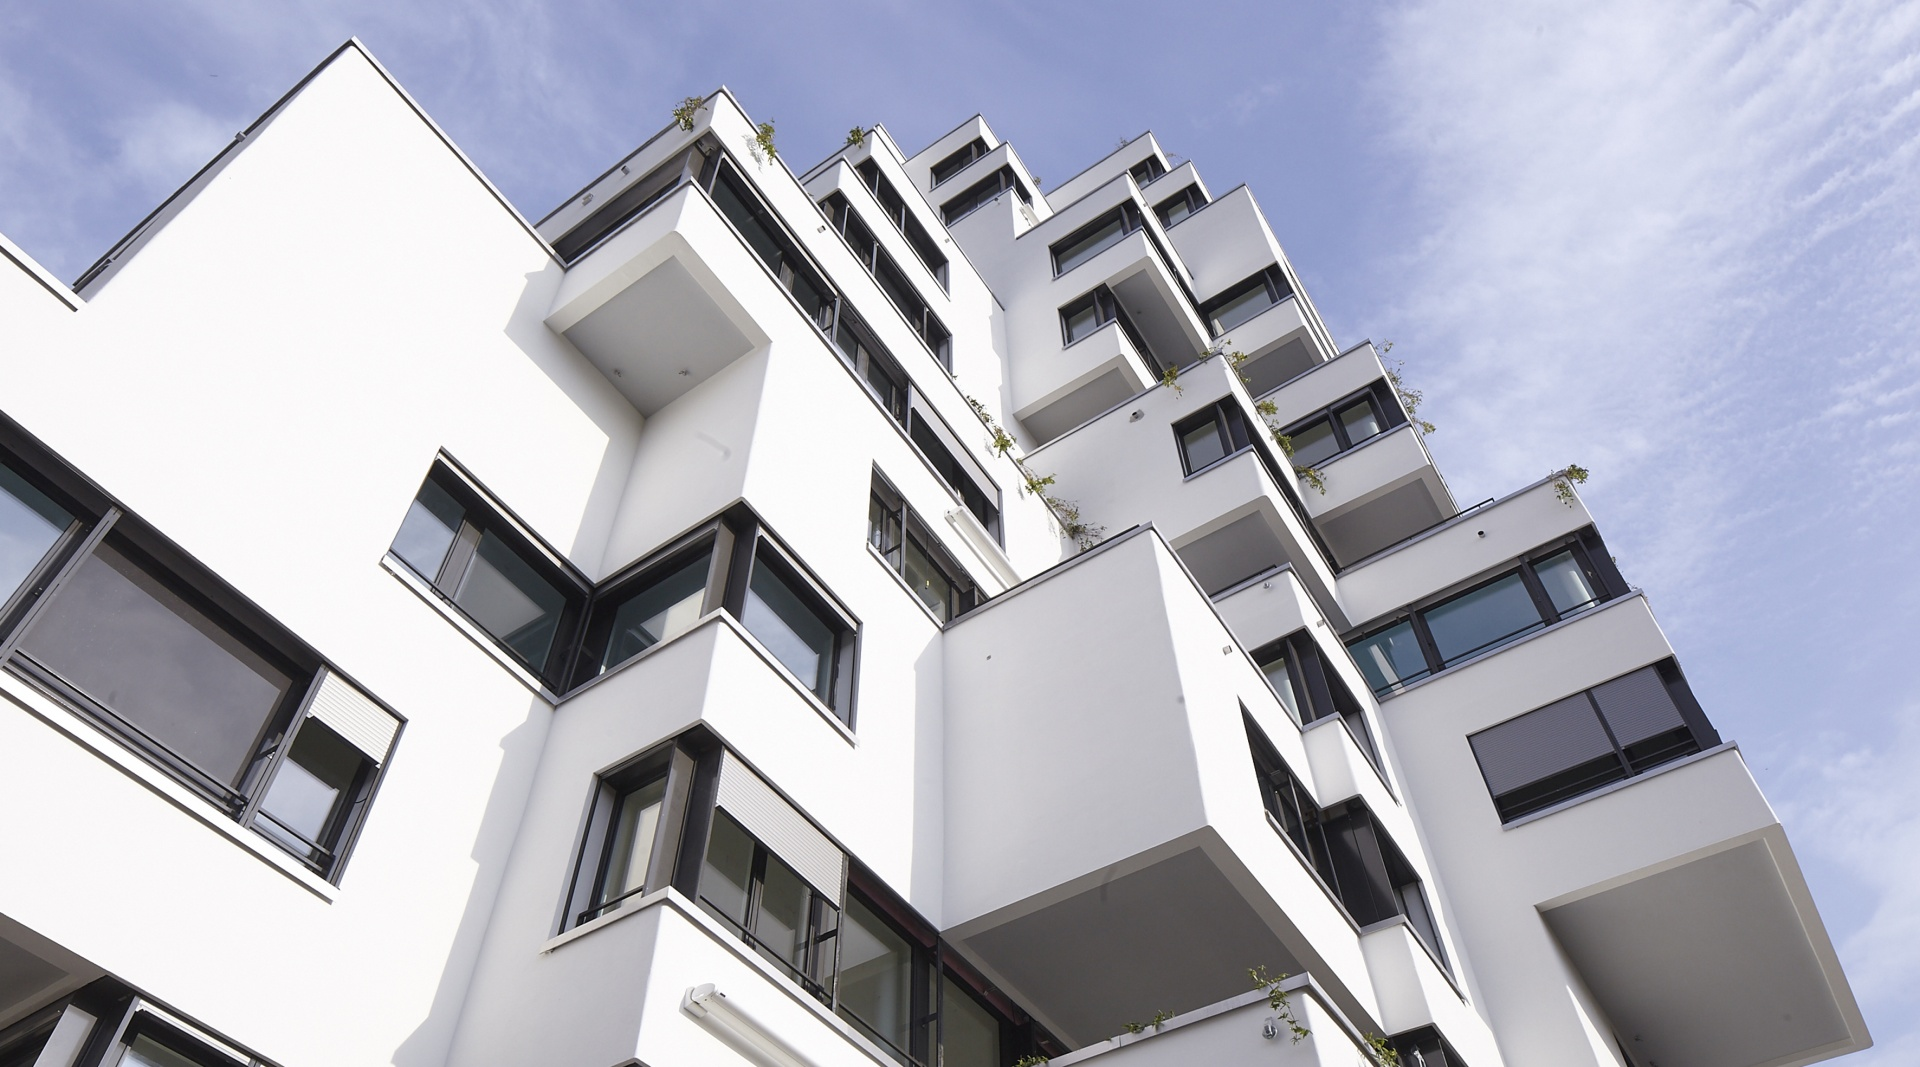 Graduation de volumen Sollturm © Architektur Rolf Stalder AG / Maria Gambino